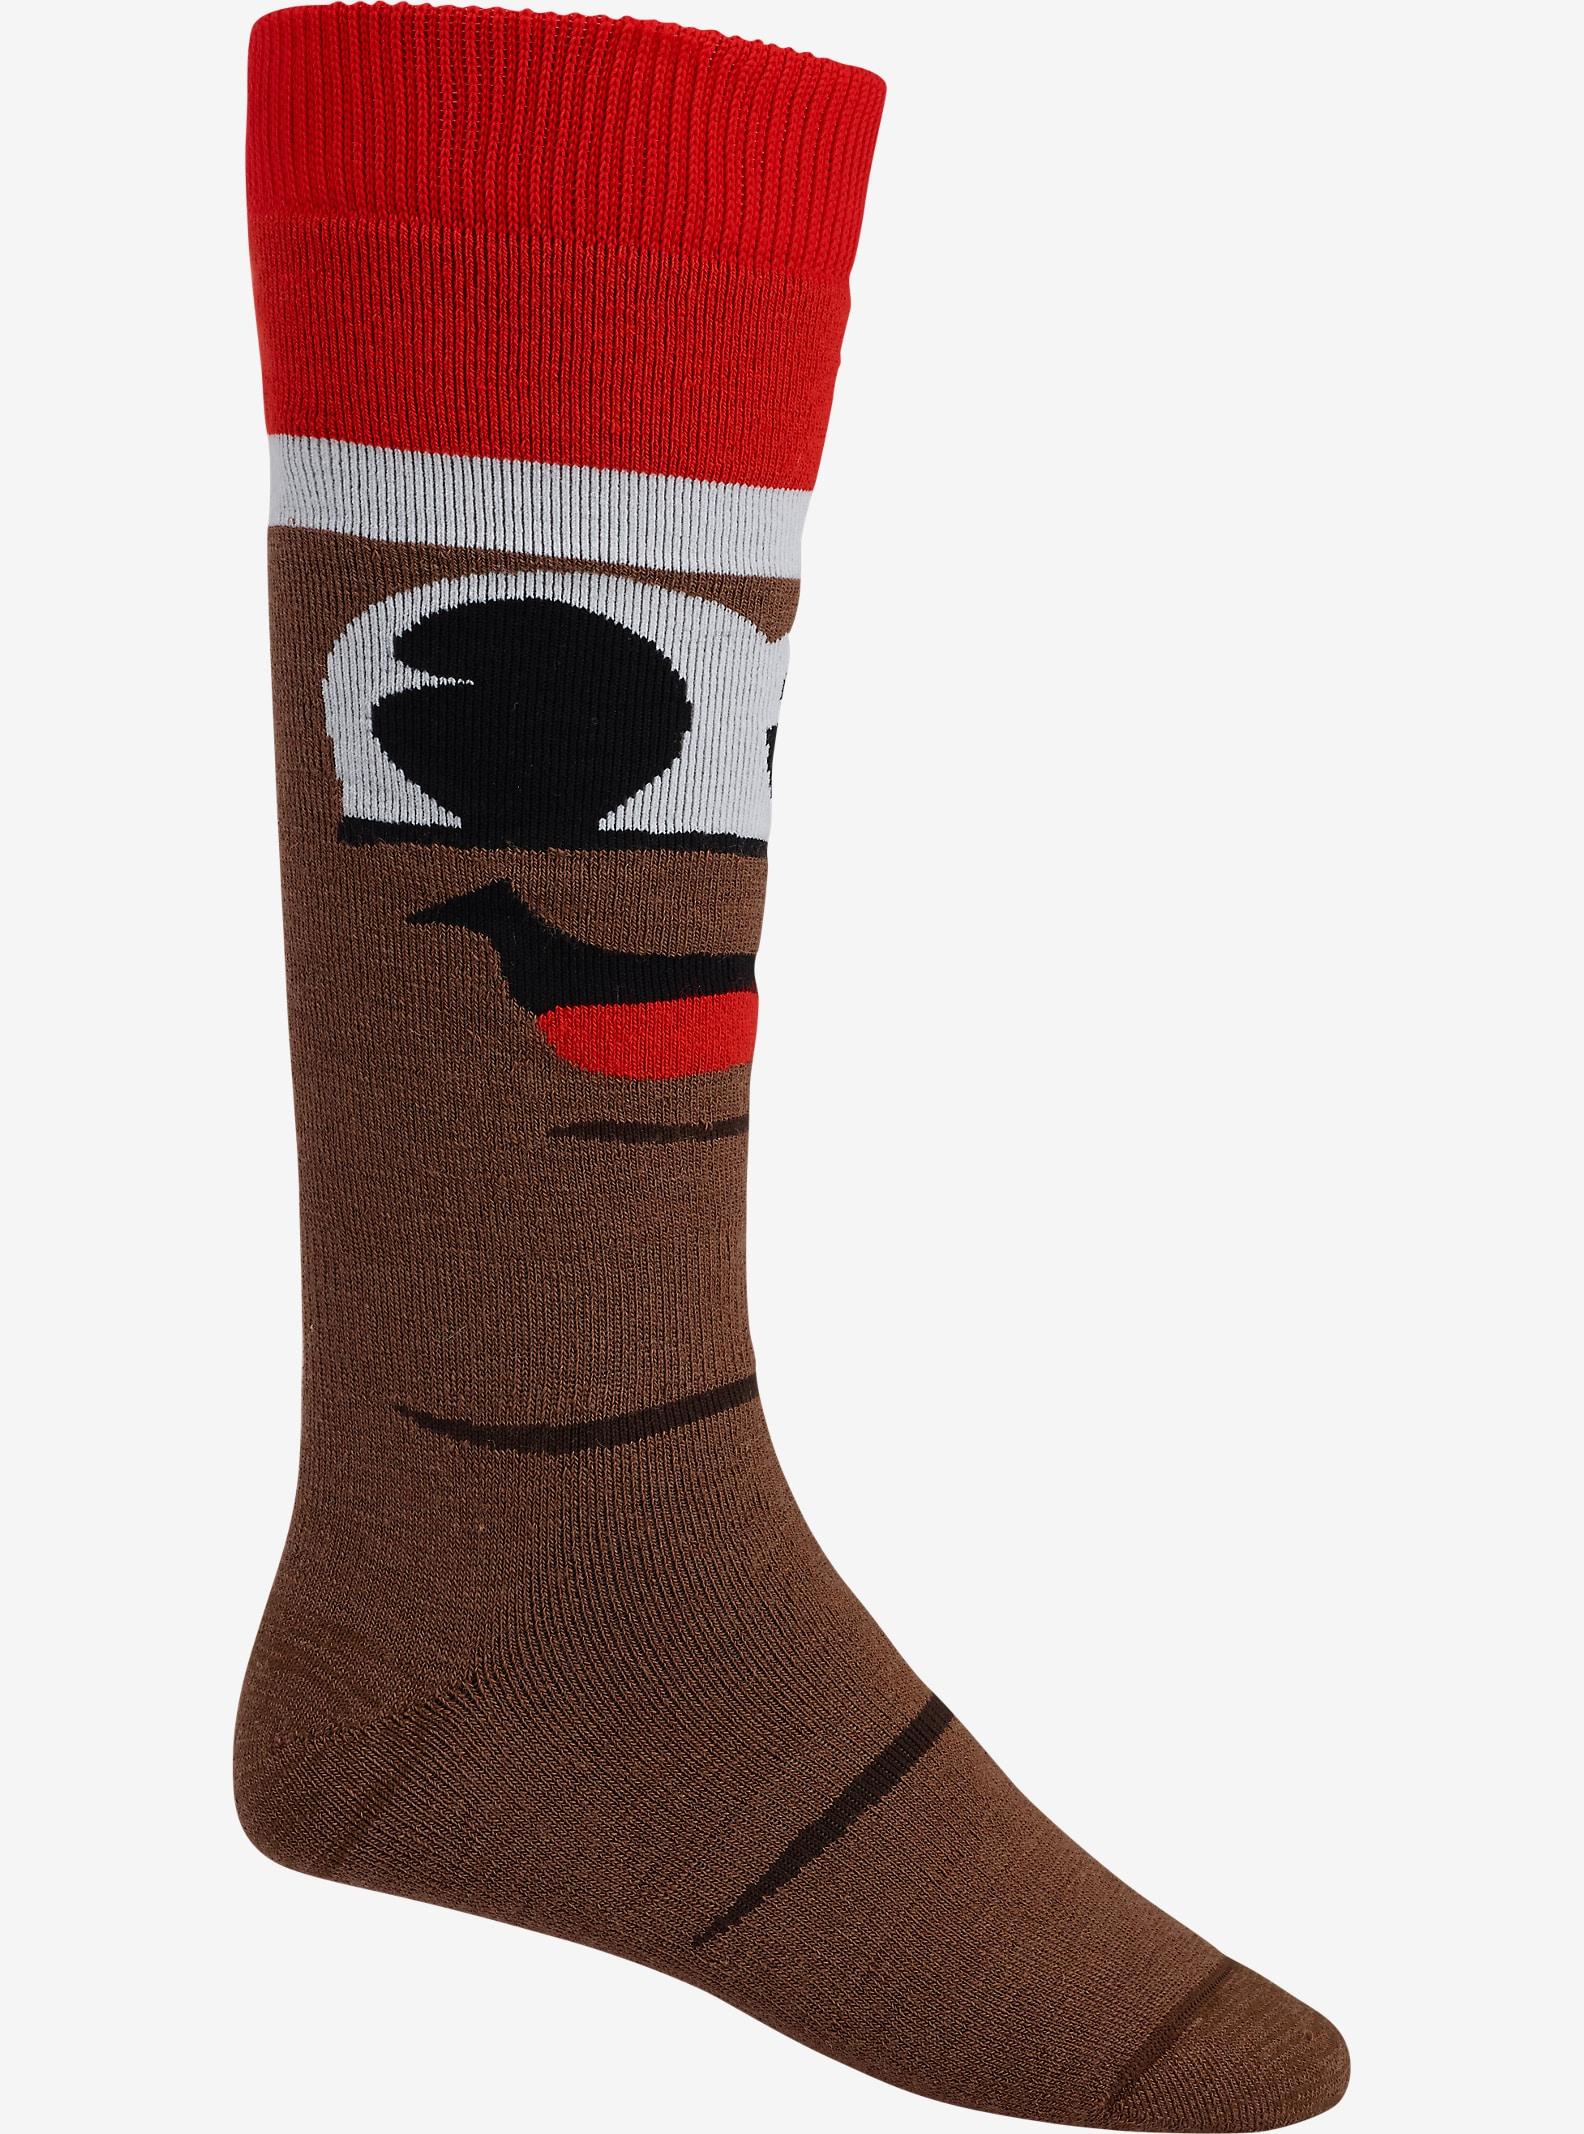 Burton x South Park Mr. Hankey Party Sock shown in Mr. Hankey